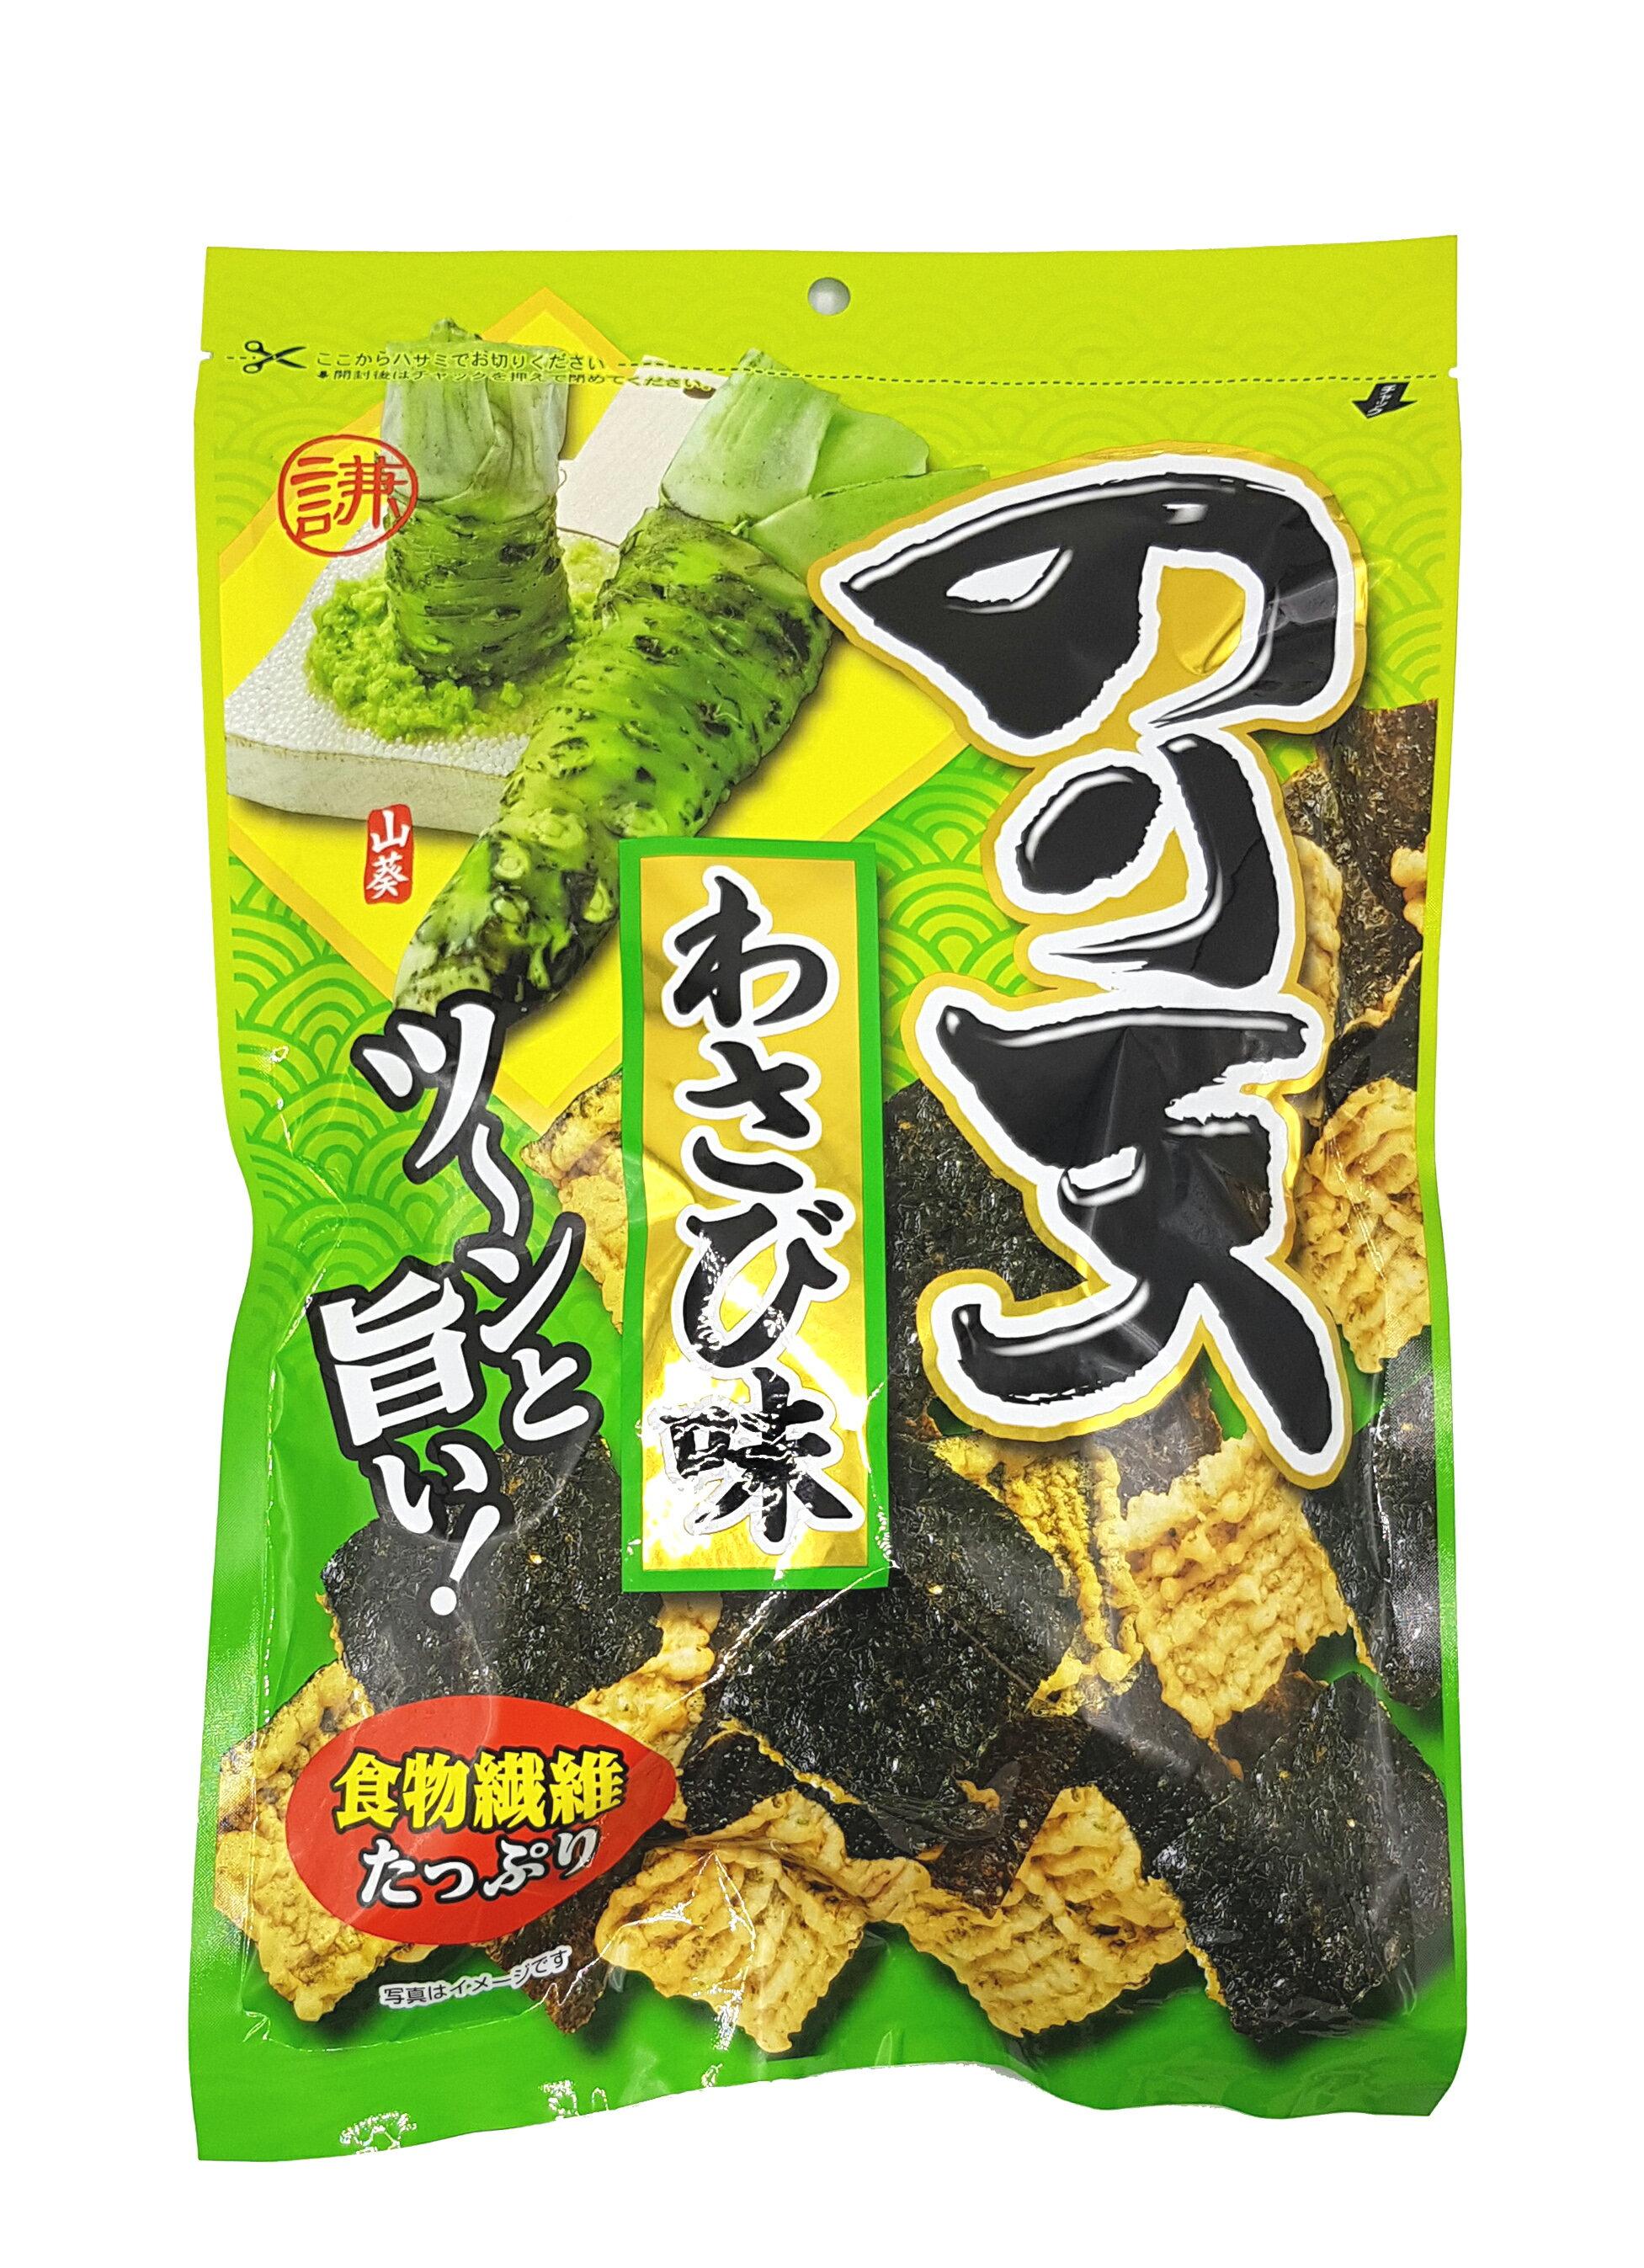 《Chara 微百貨》日本 井上 瀨戶 Maruka 海苔 天婦羅 餅乾 丸嘉 原味 150g  /  上野 芥末口味 炸物 4